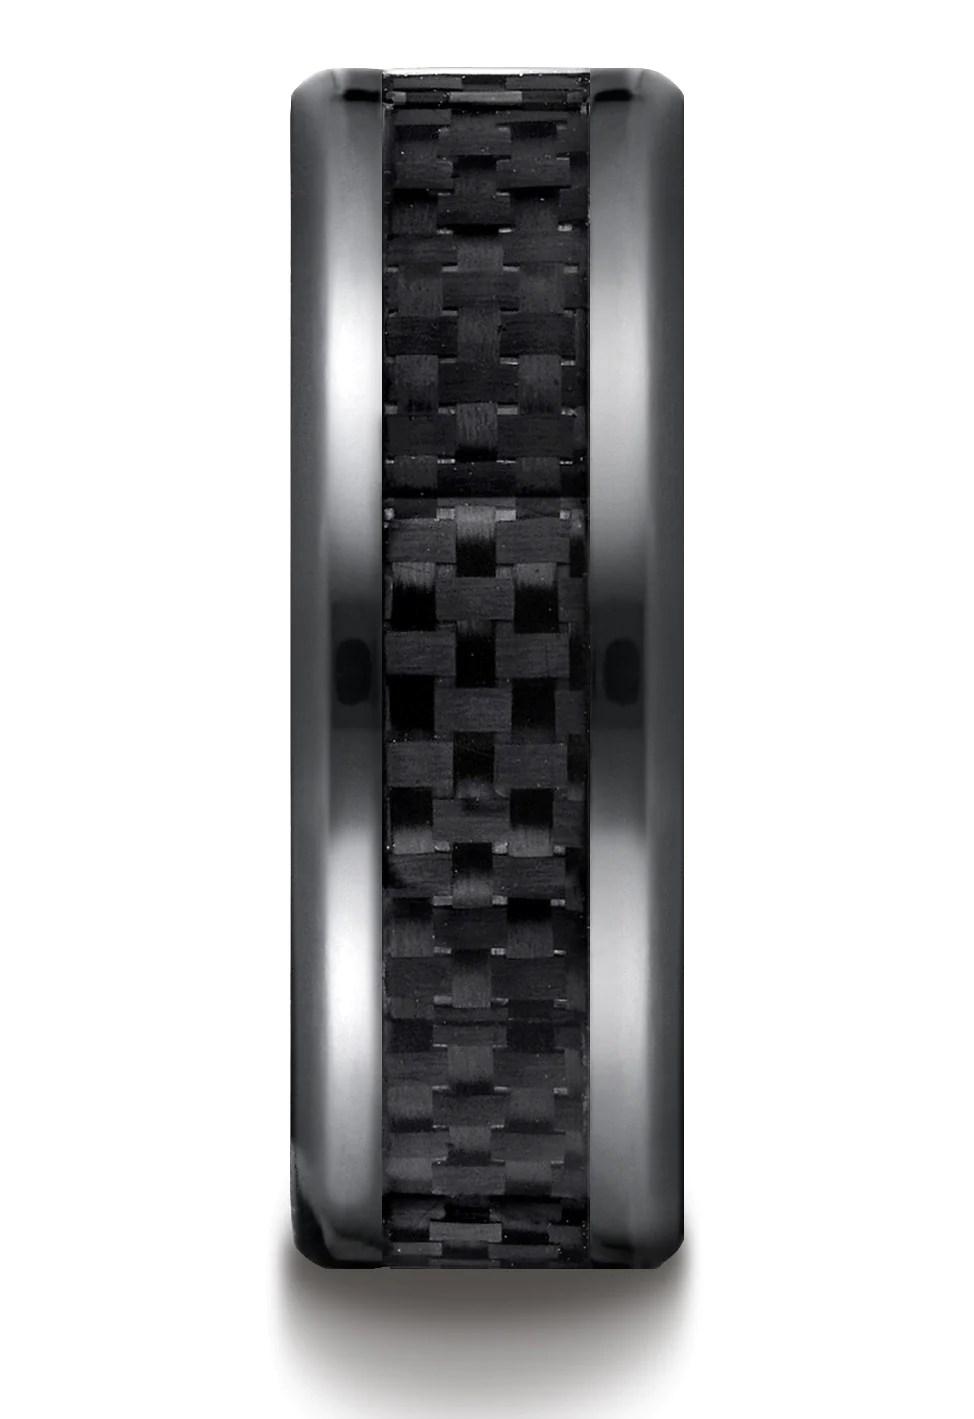 belem black titanium carbon fiber inlay wedding band for men by benchmark titanium wedding band BELEM Black Titanium Carbon Fiber Inlay Wedding Band for Men